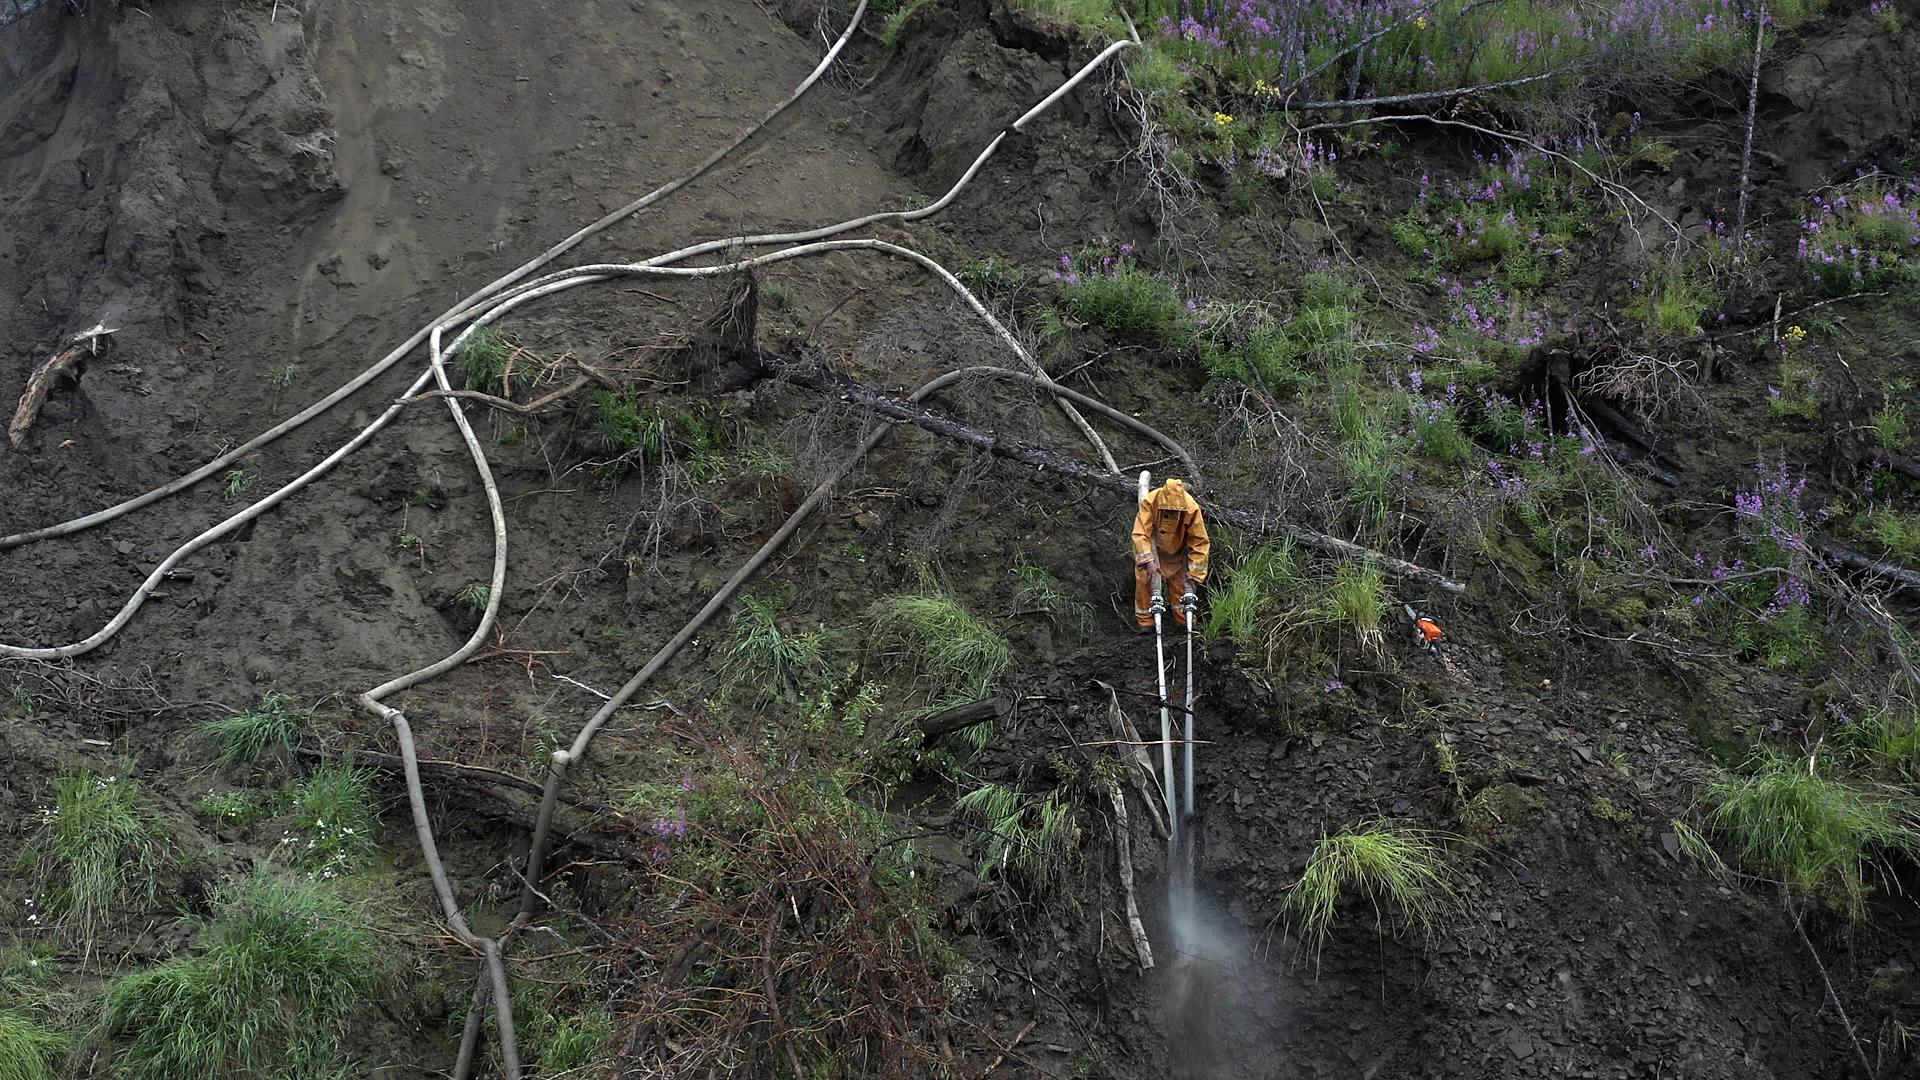 Pemburu menyemprot tanah untuk mencari gading yang terkubur.